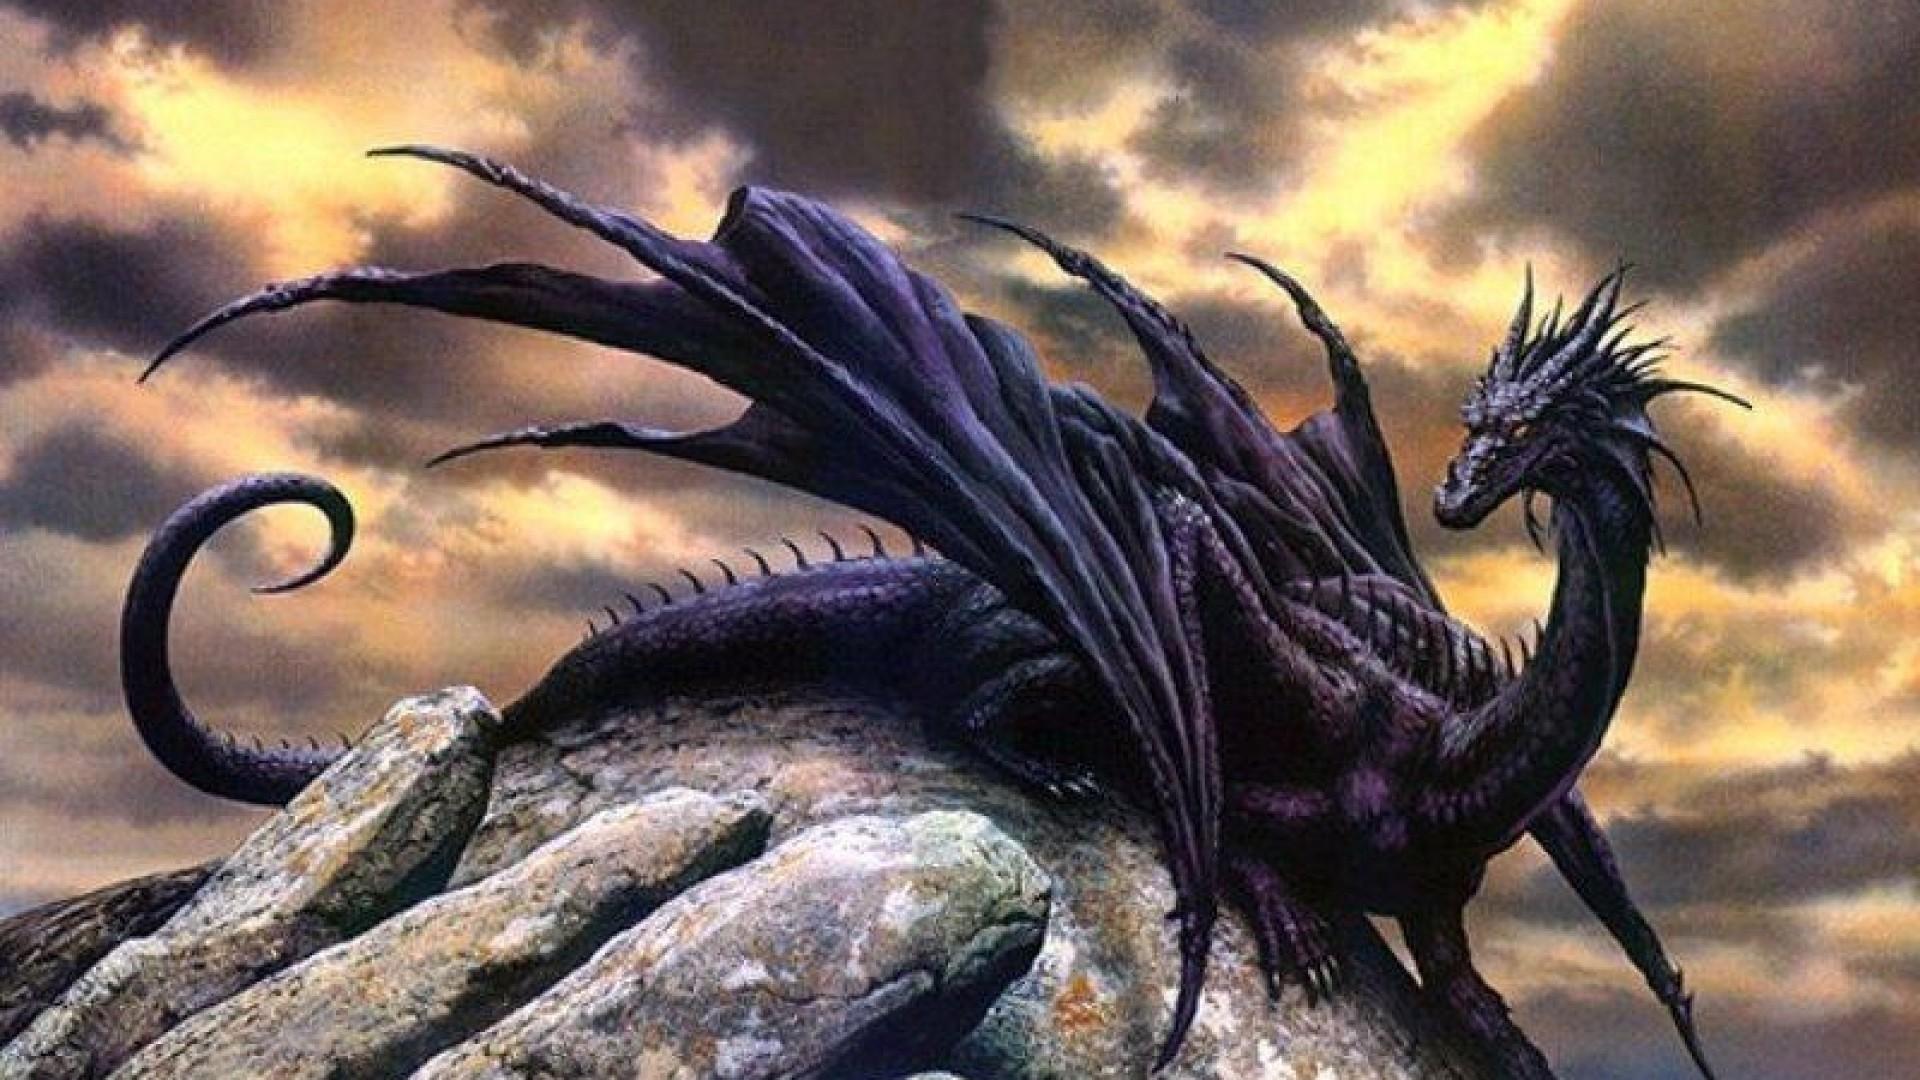 Res: 1920x1080, 5. hd-dragon-wallpaper-HD5-600x338